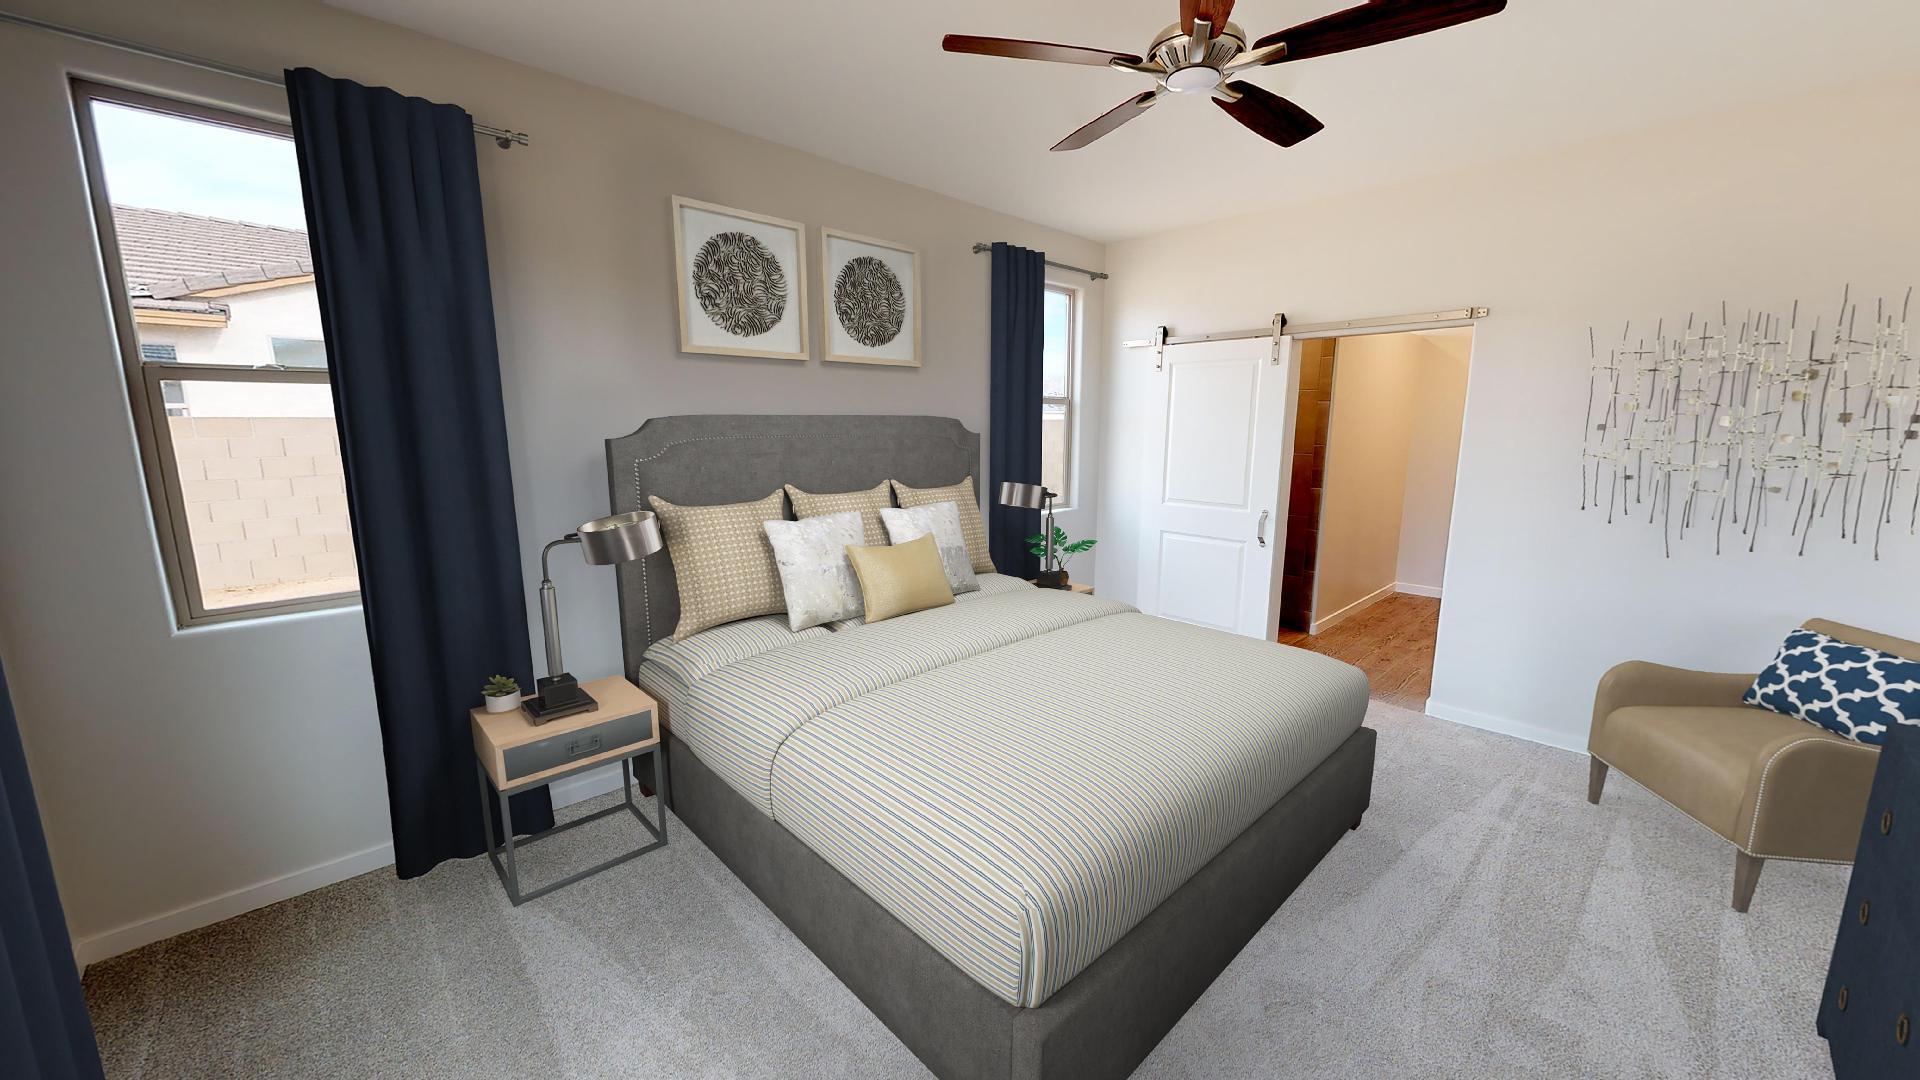 Bedroom featured in the Plan 1577 By Elliott Homes - Arizona in Yuma, AZ